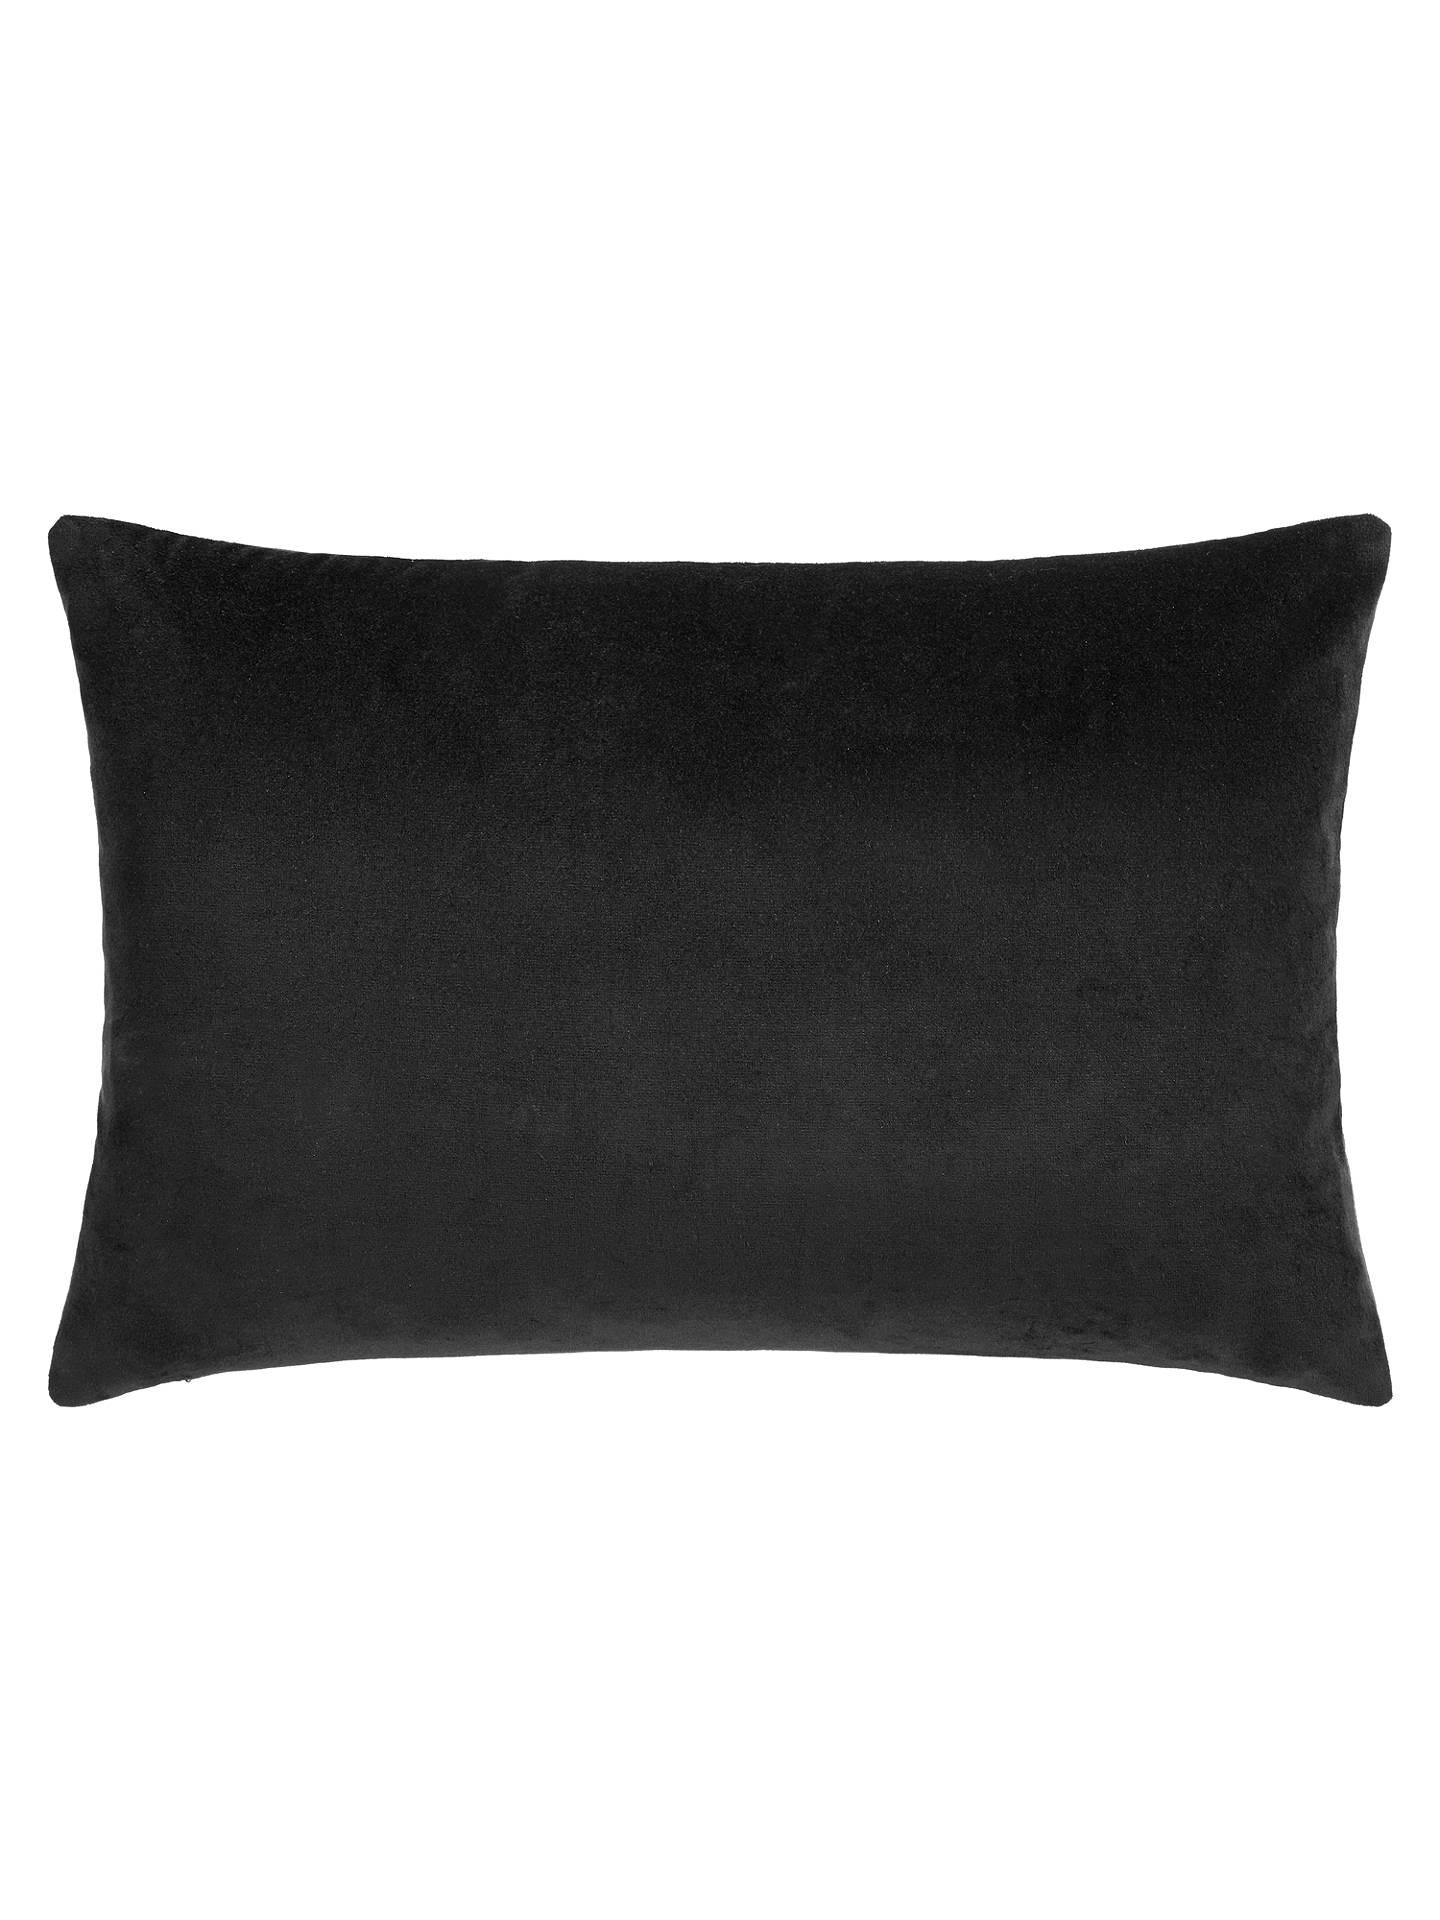 john lewis london skyline cushion multi at john lewis. Black Bedroom Furniture Sets. Home Design Ideas